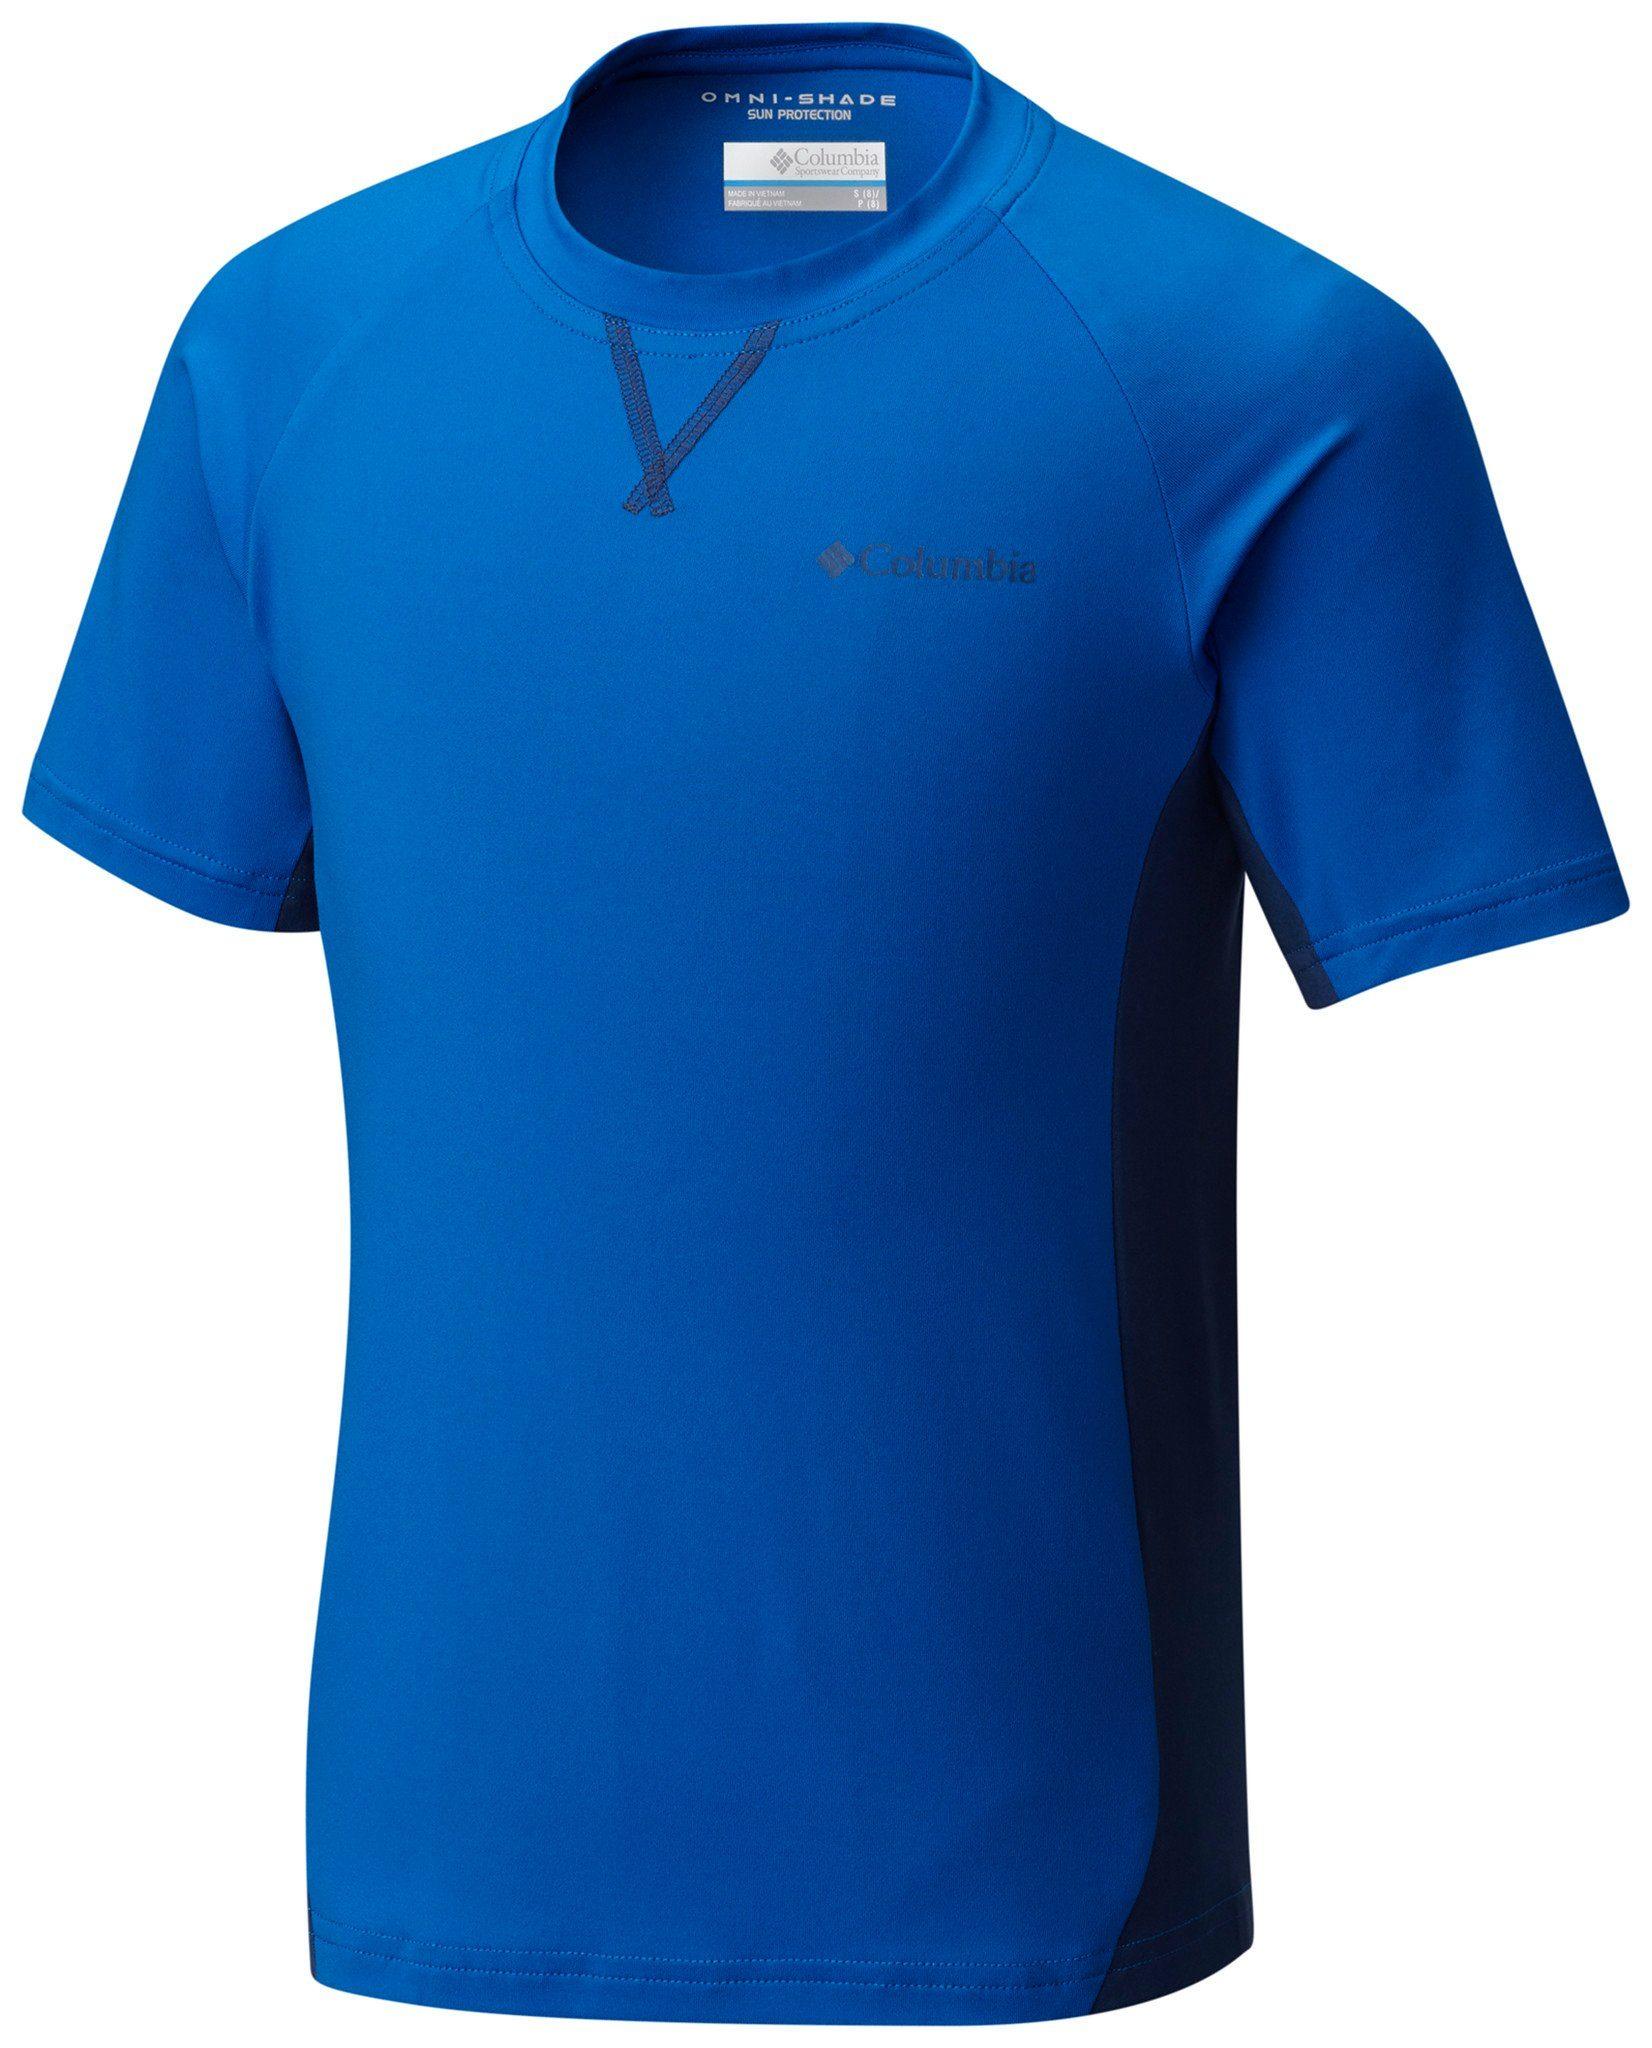 Columbia T-Shirt »Silver Ridge Short Sleeved Tee Boys«